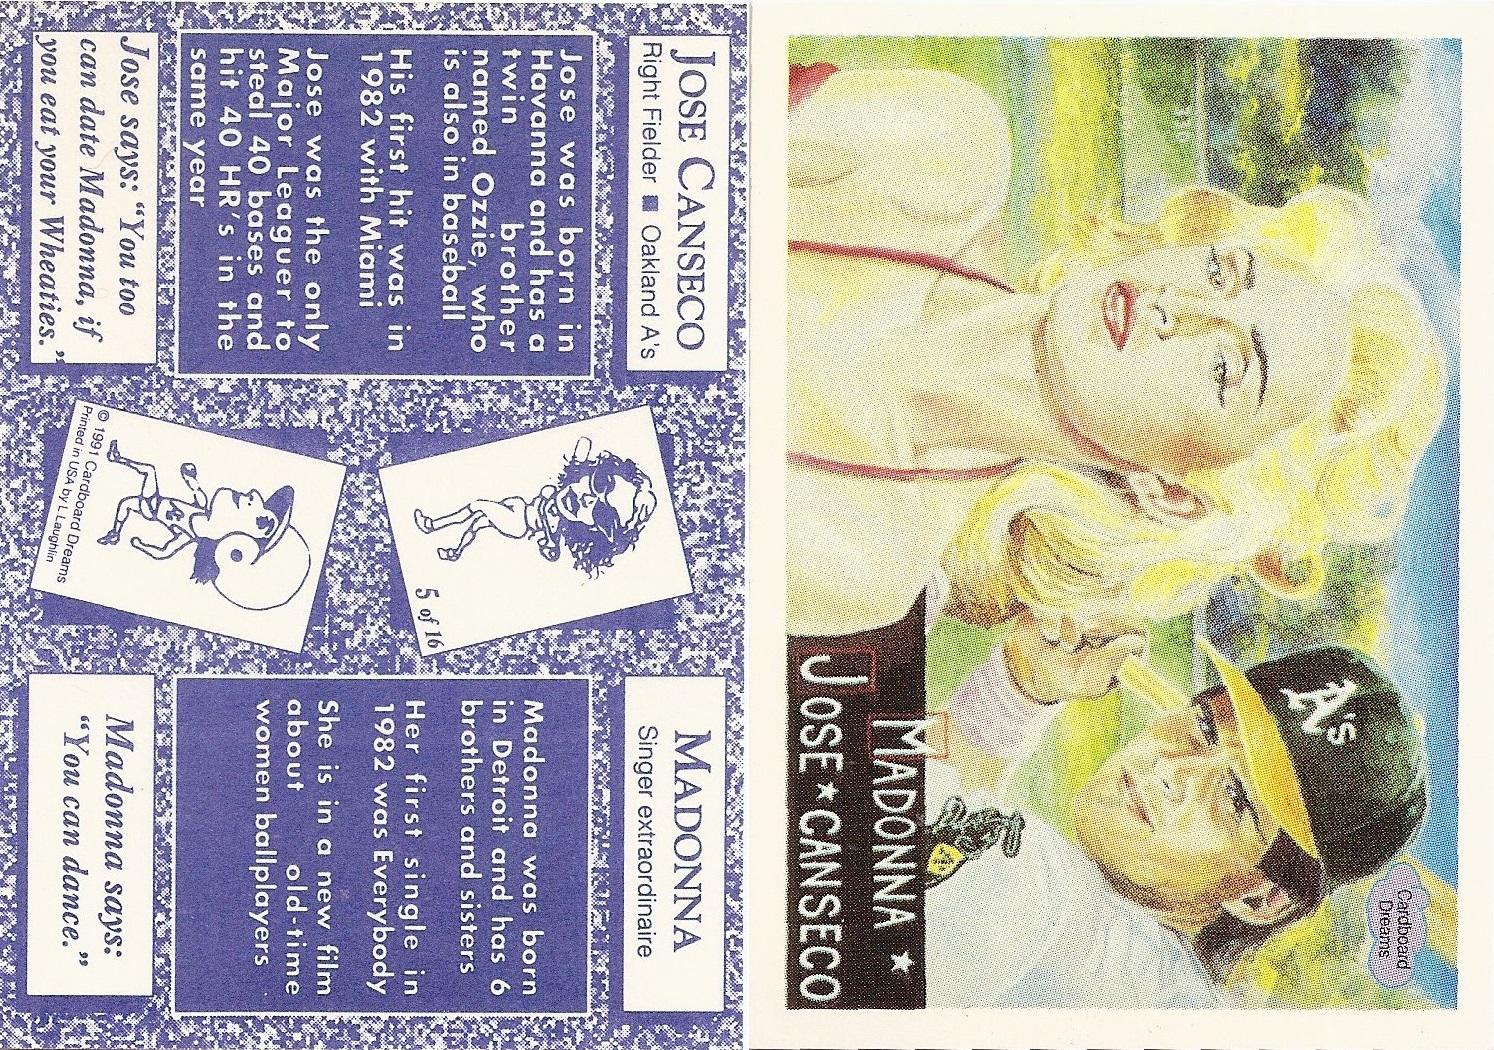 SCAN8461 - Copy (7)